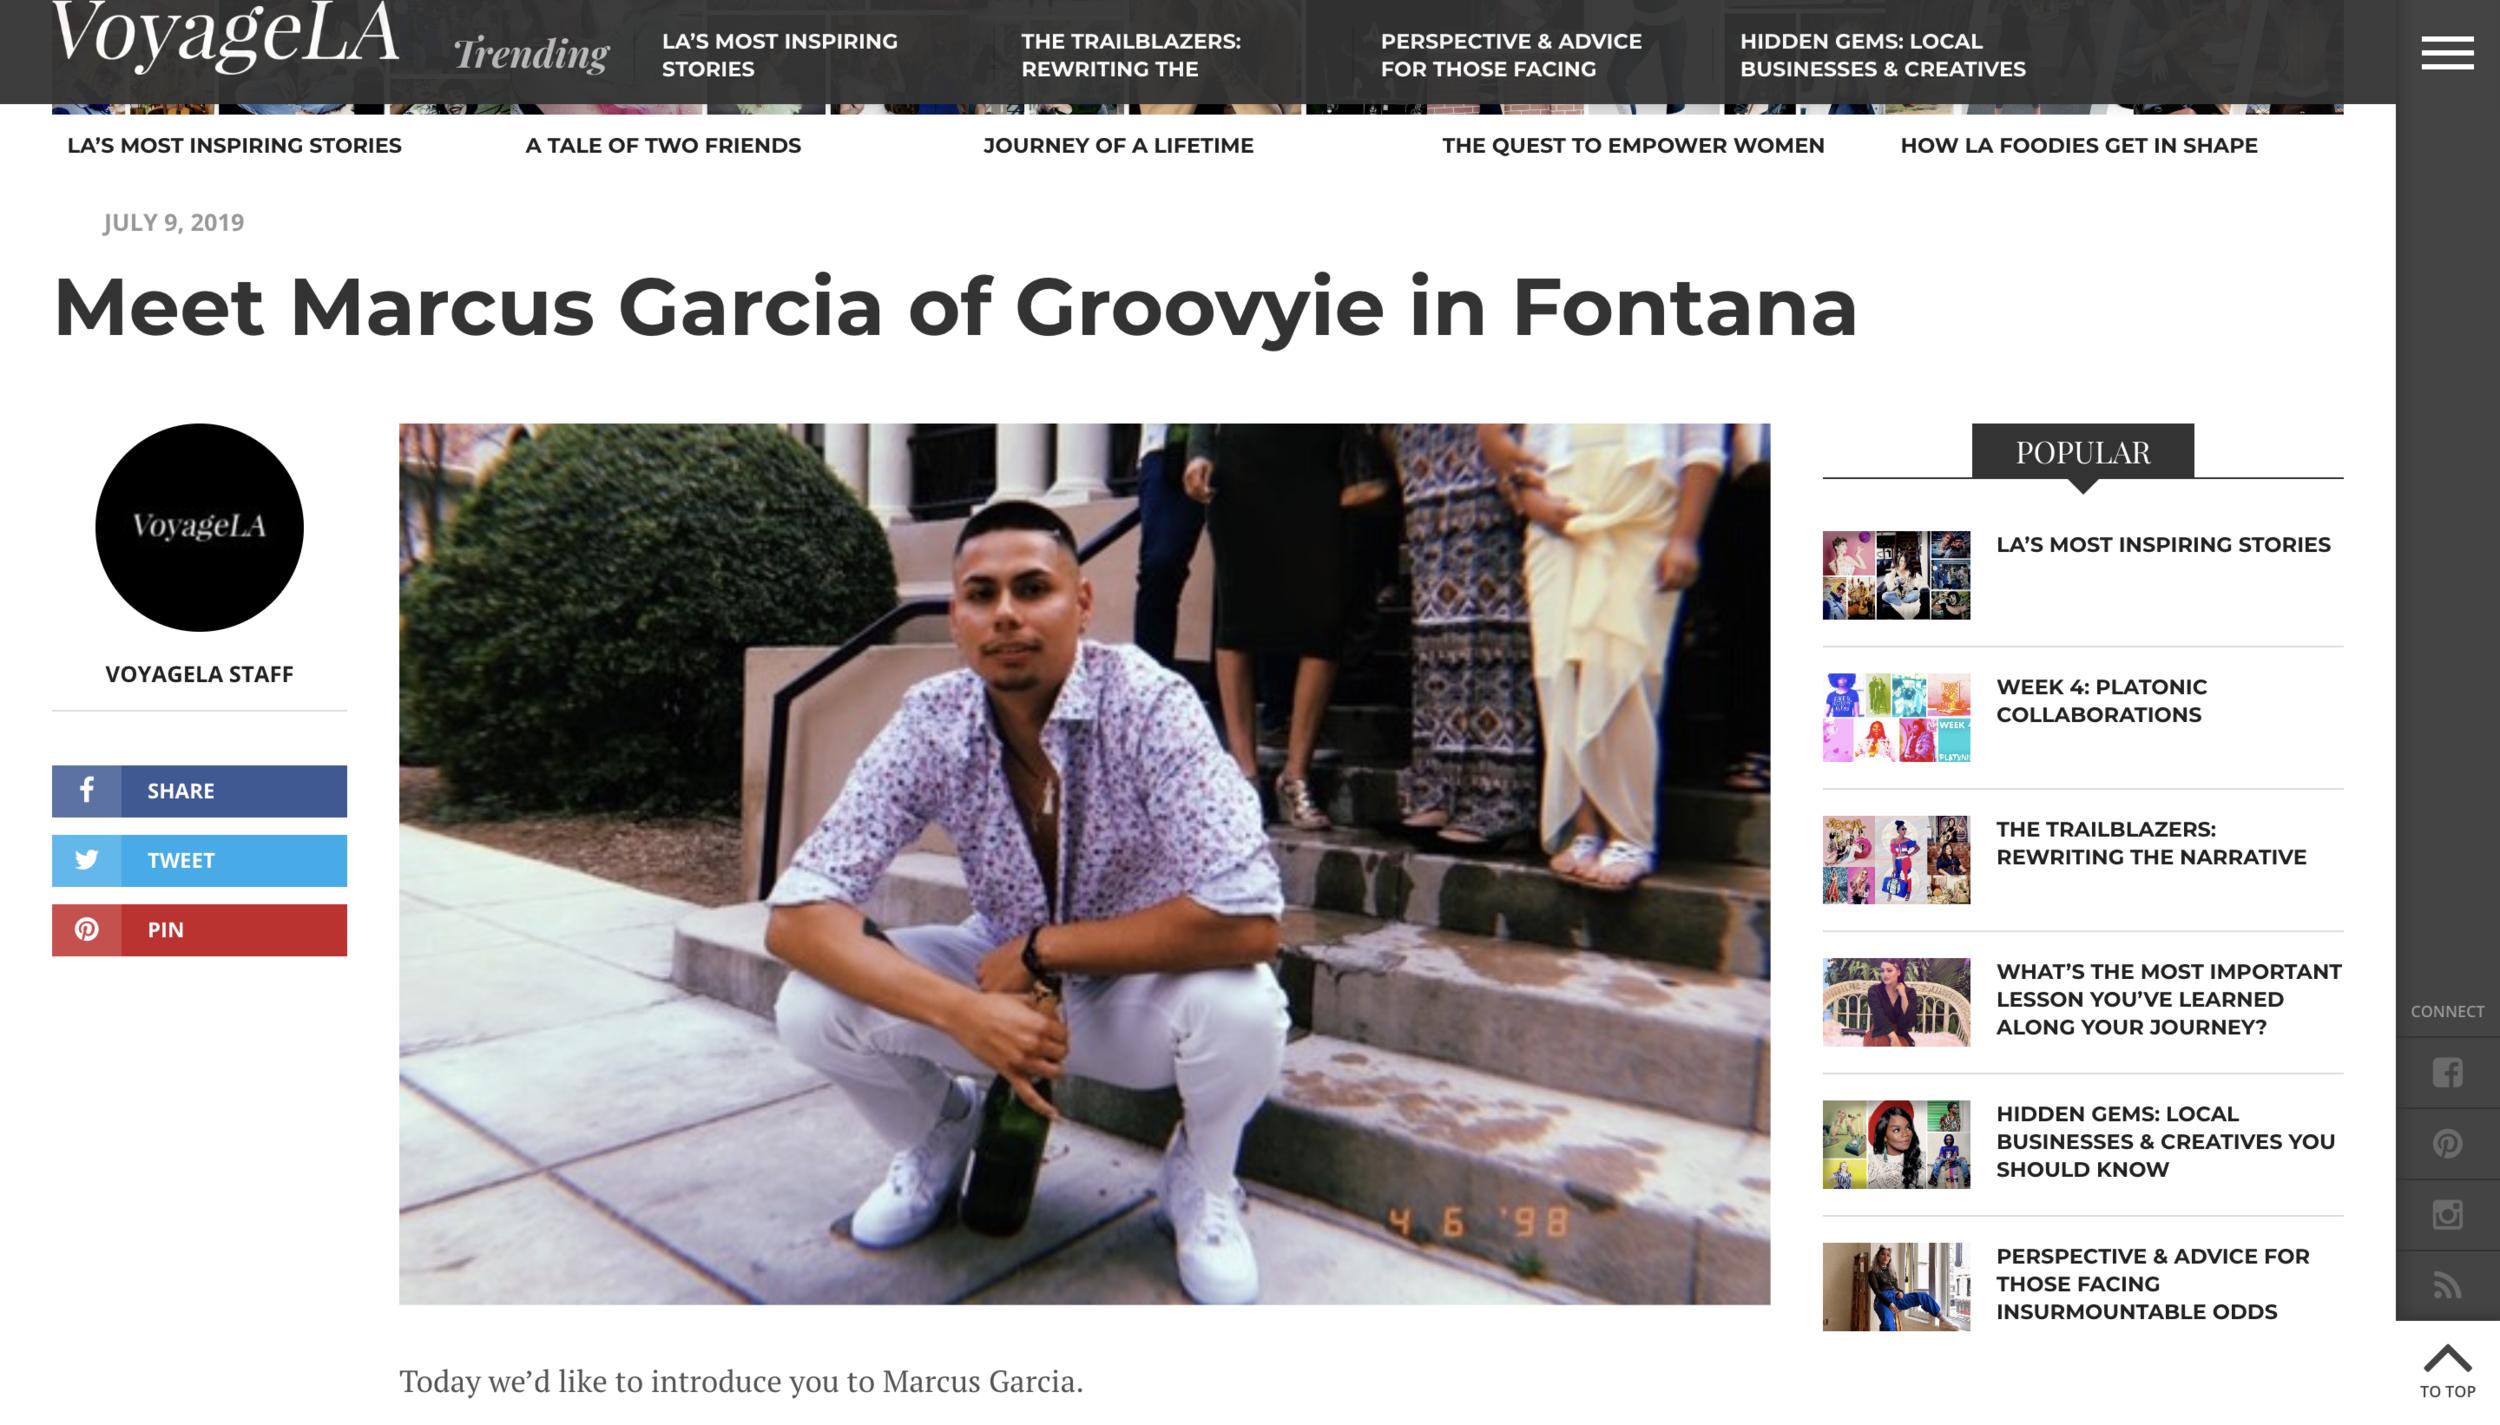 VoyageLA Magazine - Meet Marcus Garcia of GROOVYie in Fontana  July 9, 2019